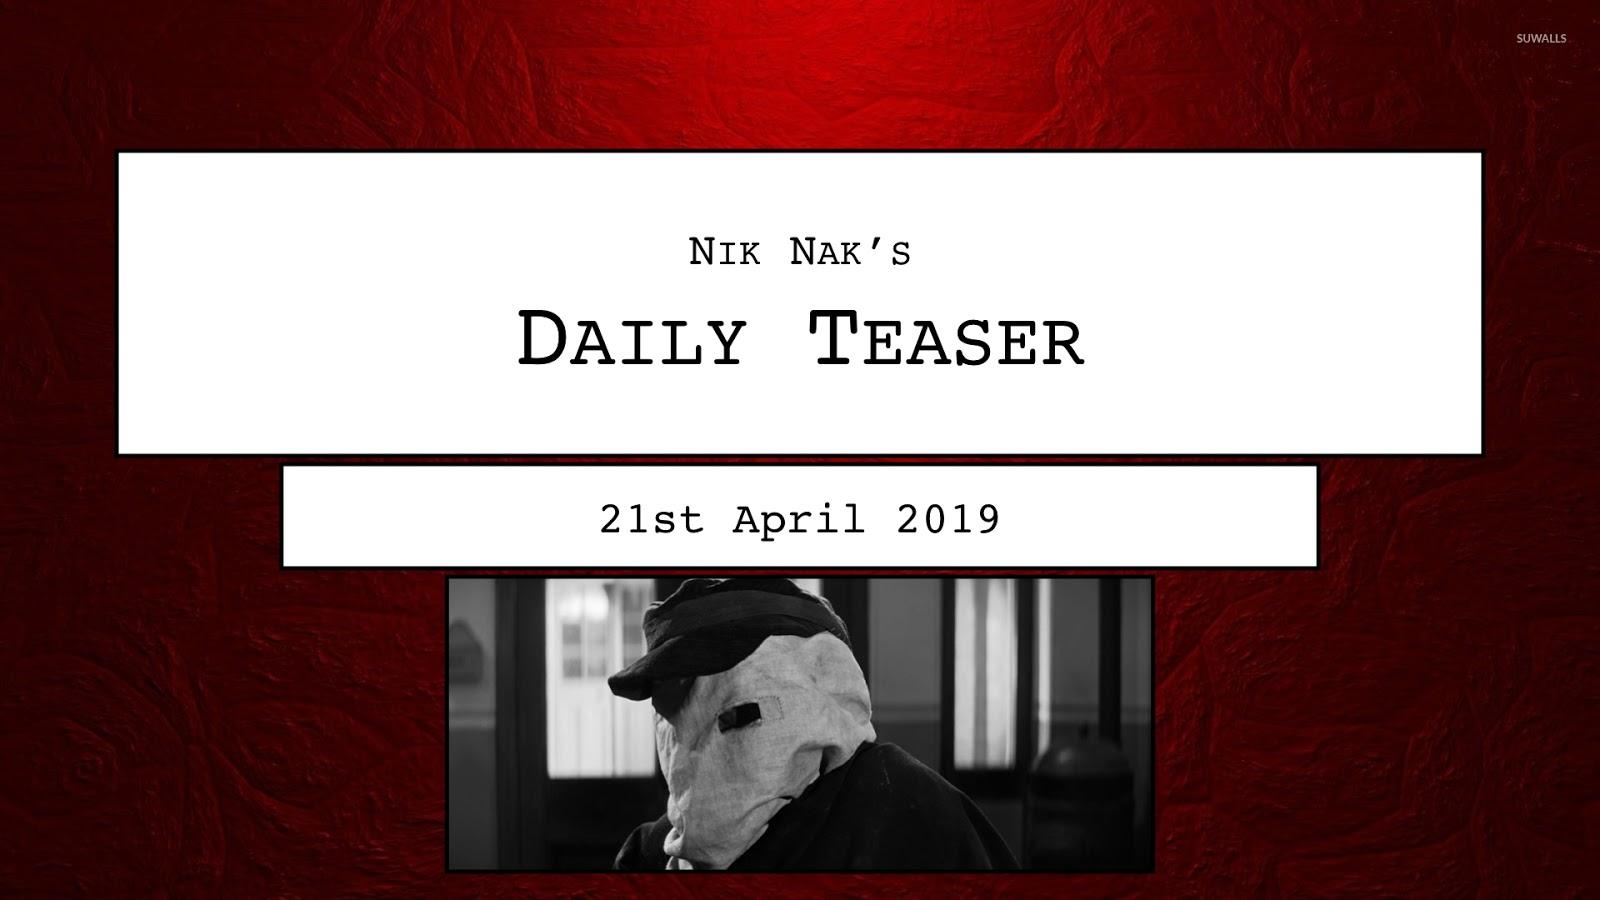 8ed2de046a2 Nik Nak s Old Peculiar  Nik Nak s Daily Teaser — 21st April 2019